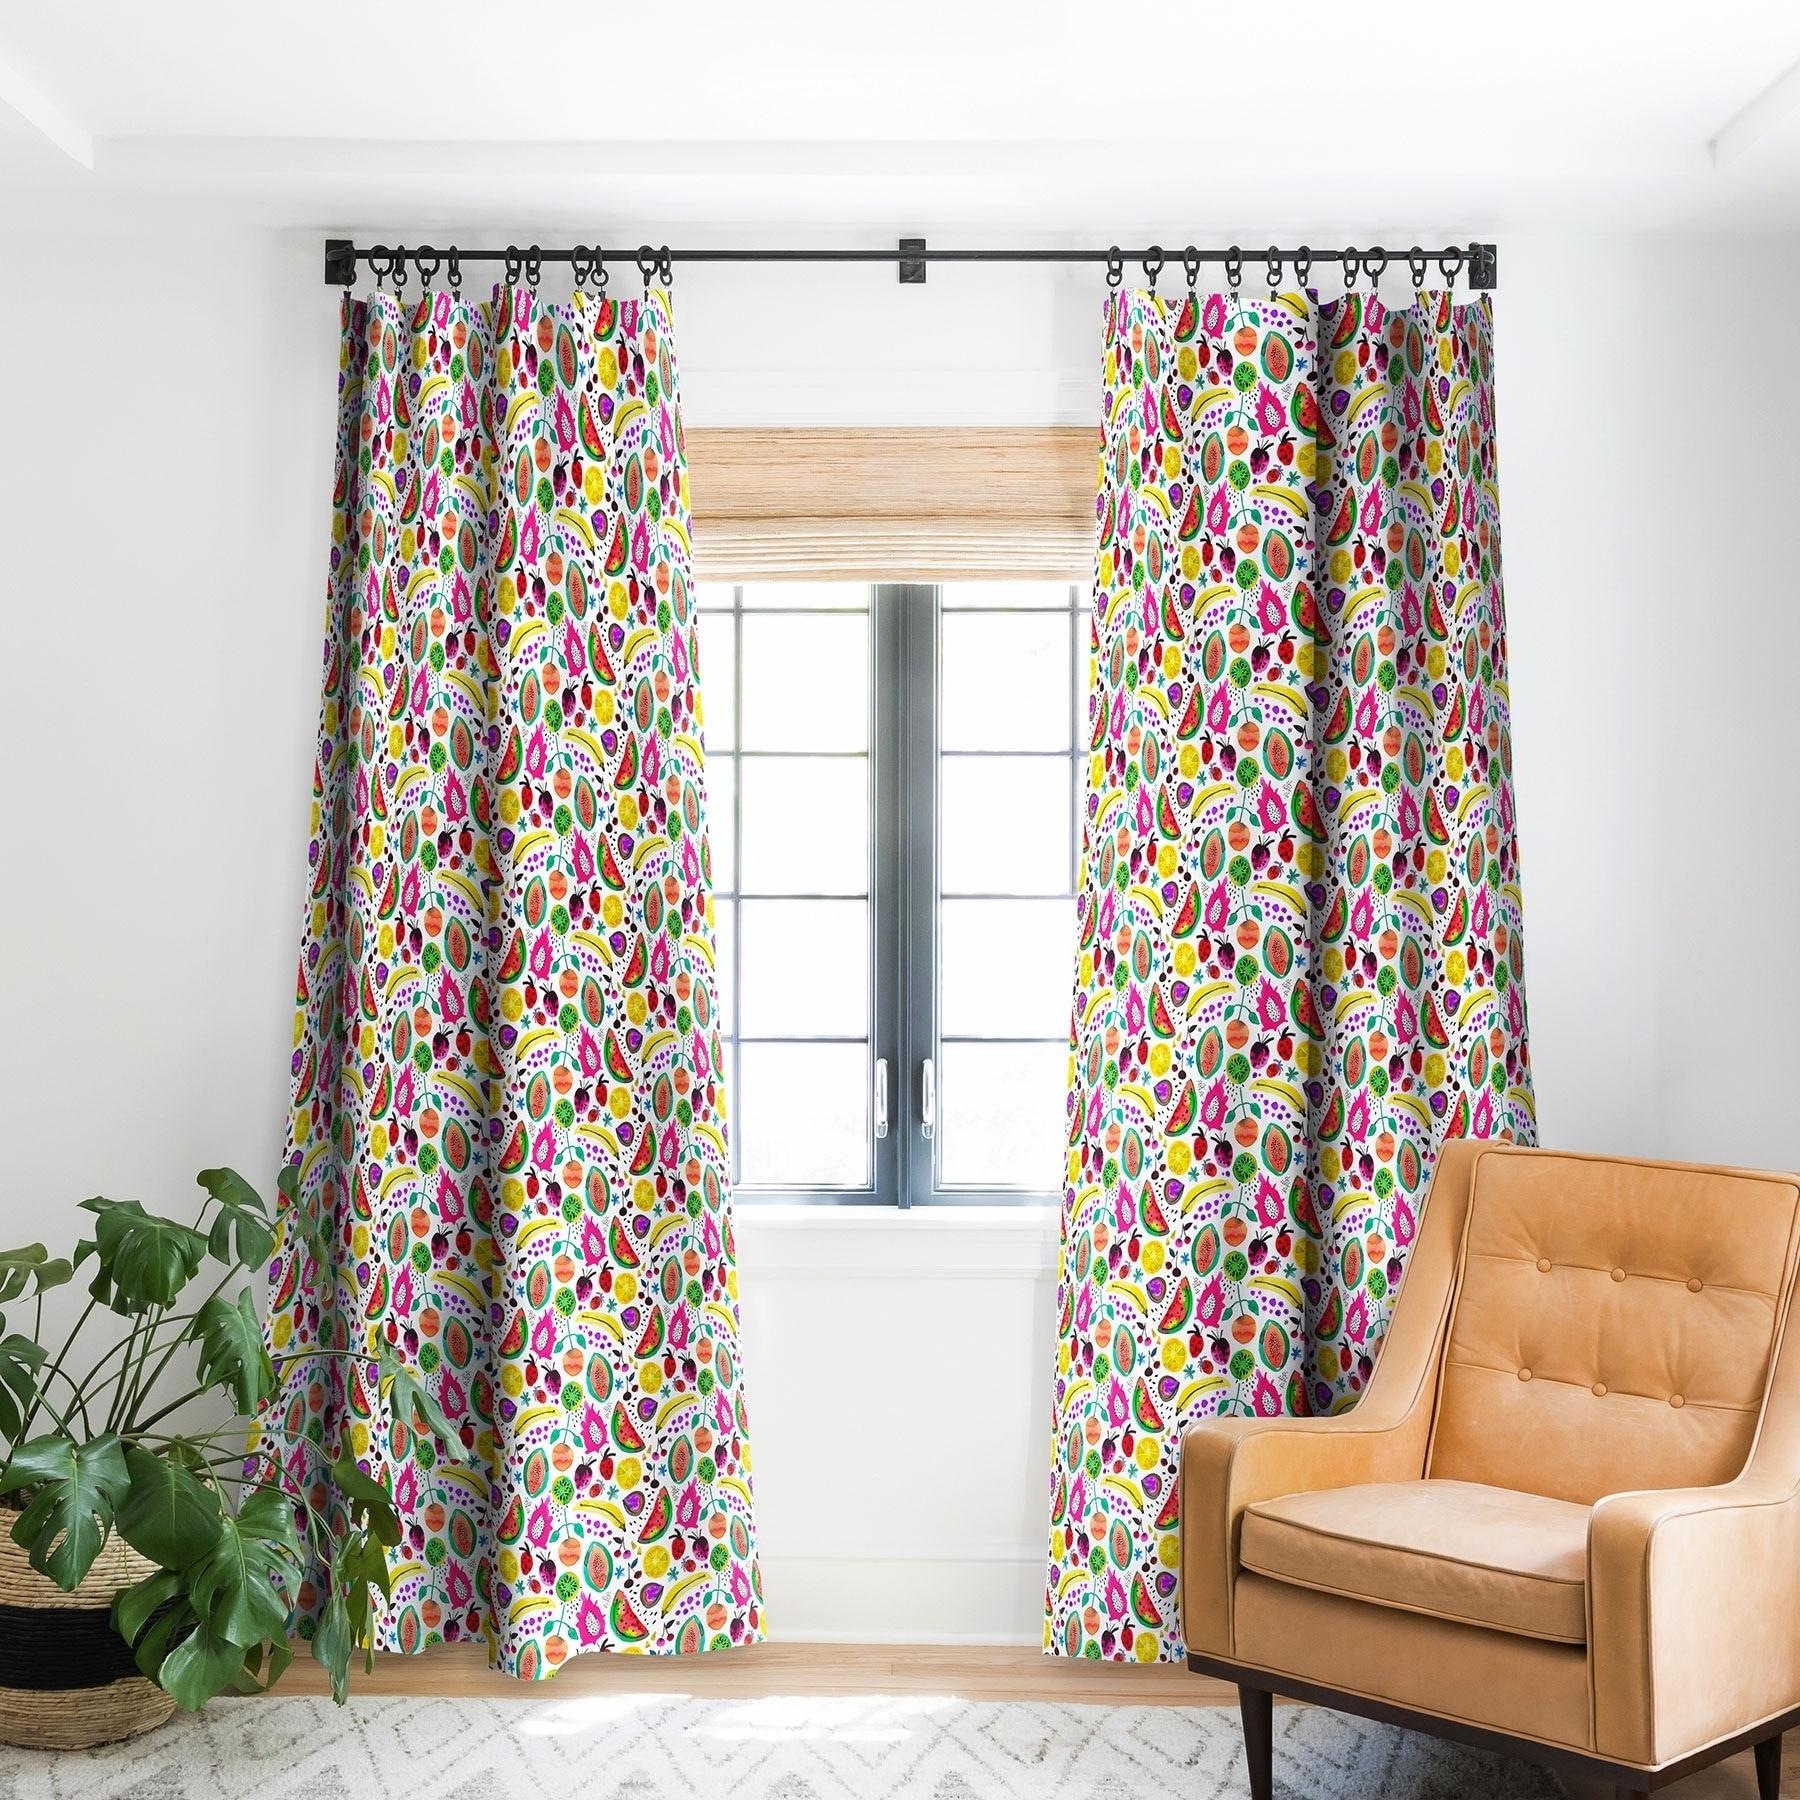 Deny Designs Fruits Papaya Blackout Curtain Panel 2 Size Options On Sale Overstock 28313523